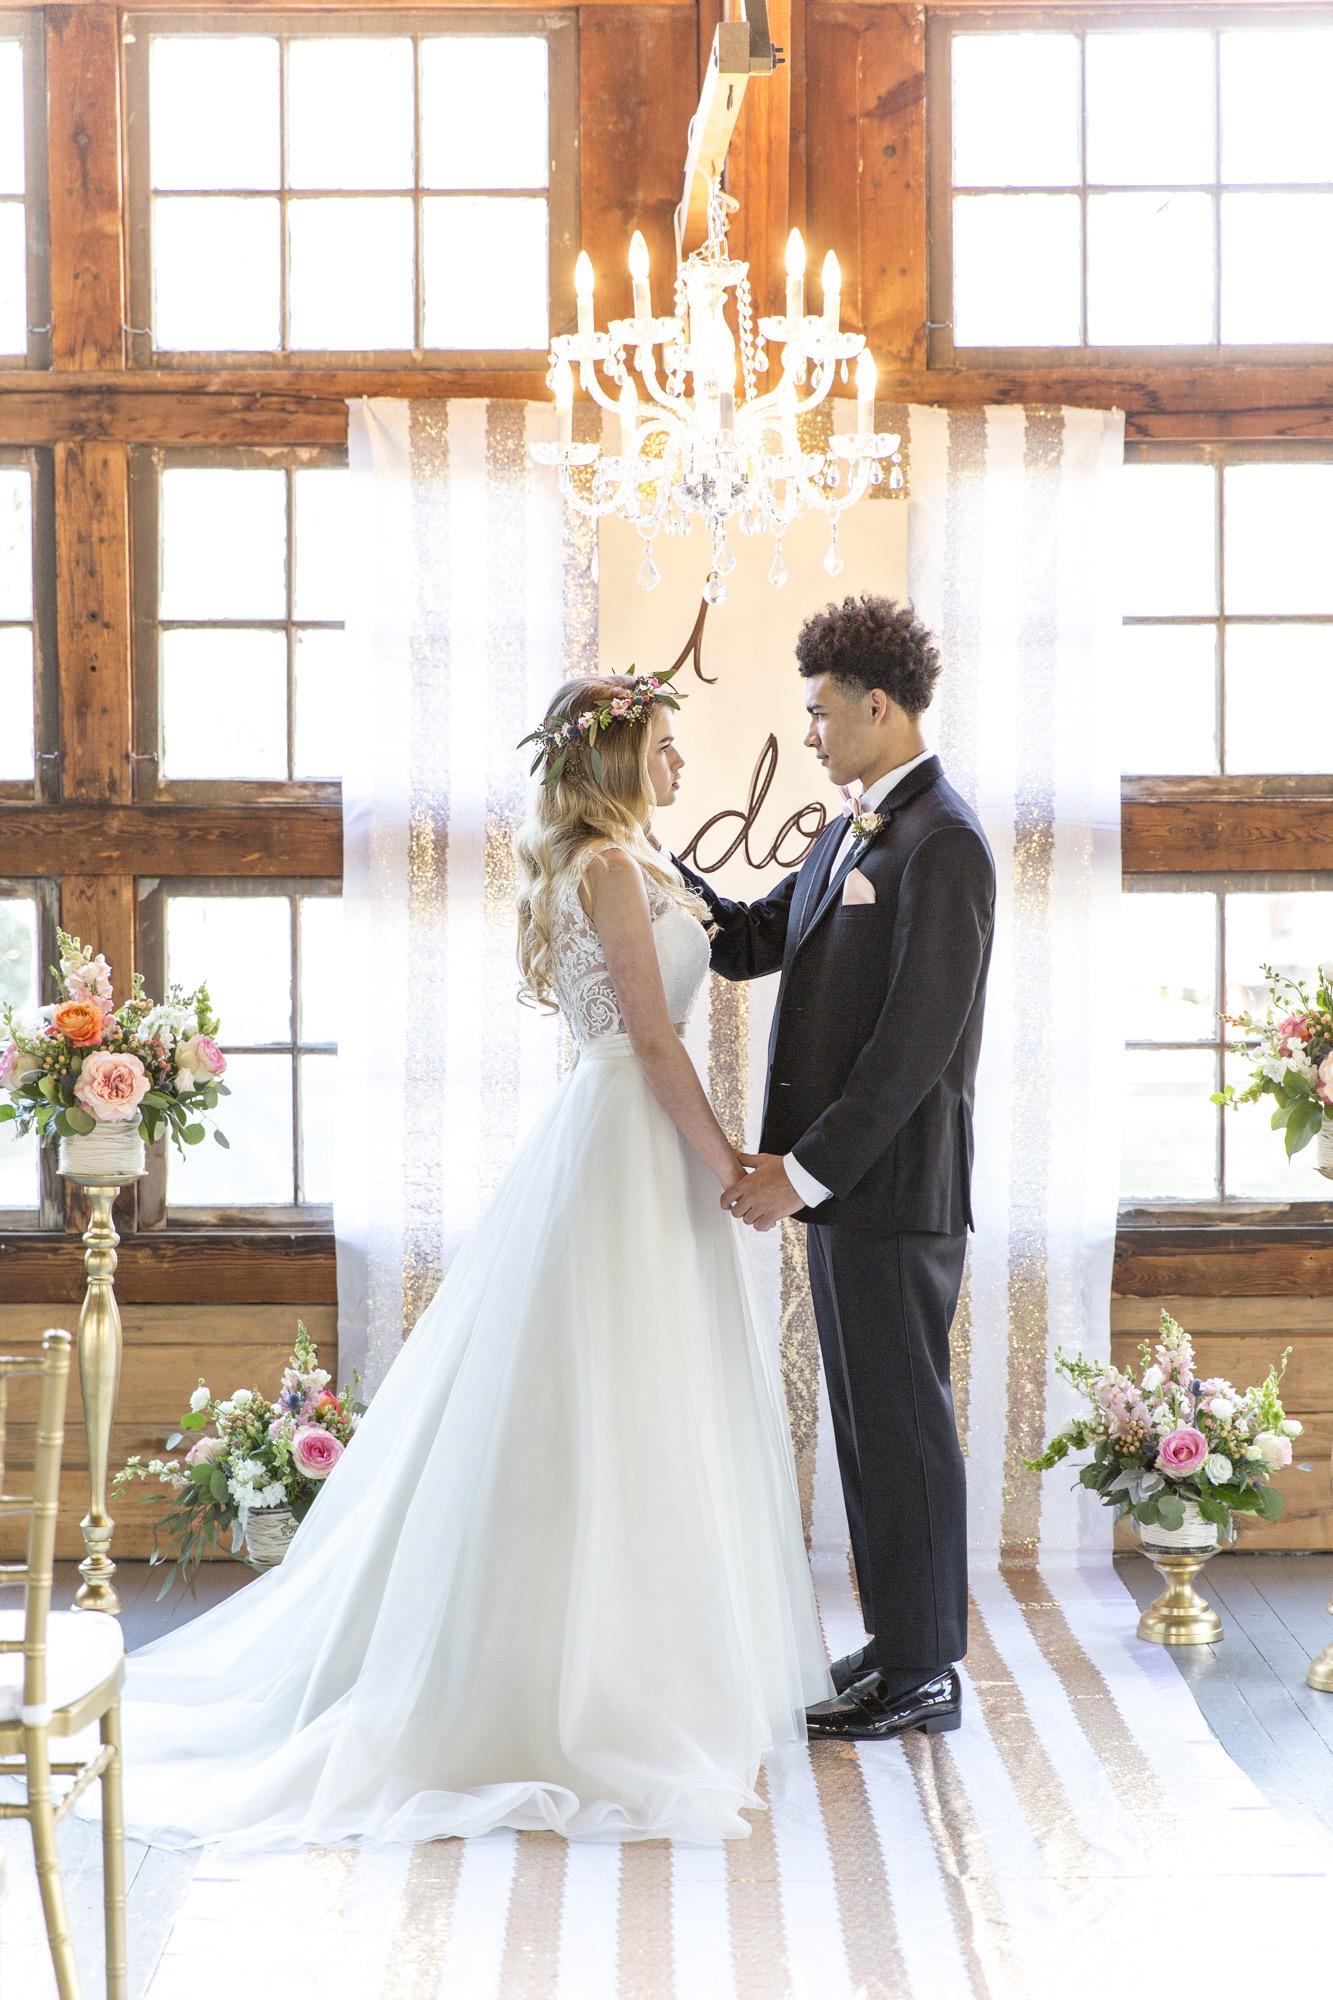 0678_Churchills-Wedding-Shoot-Photography-Luxury_P0148-2.jpg